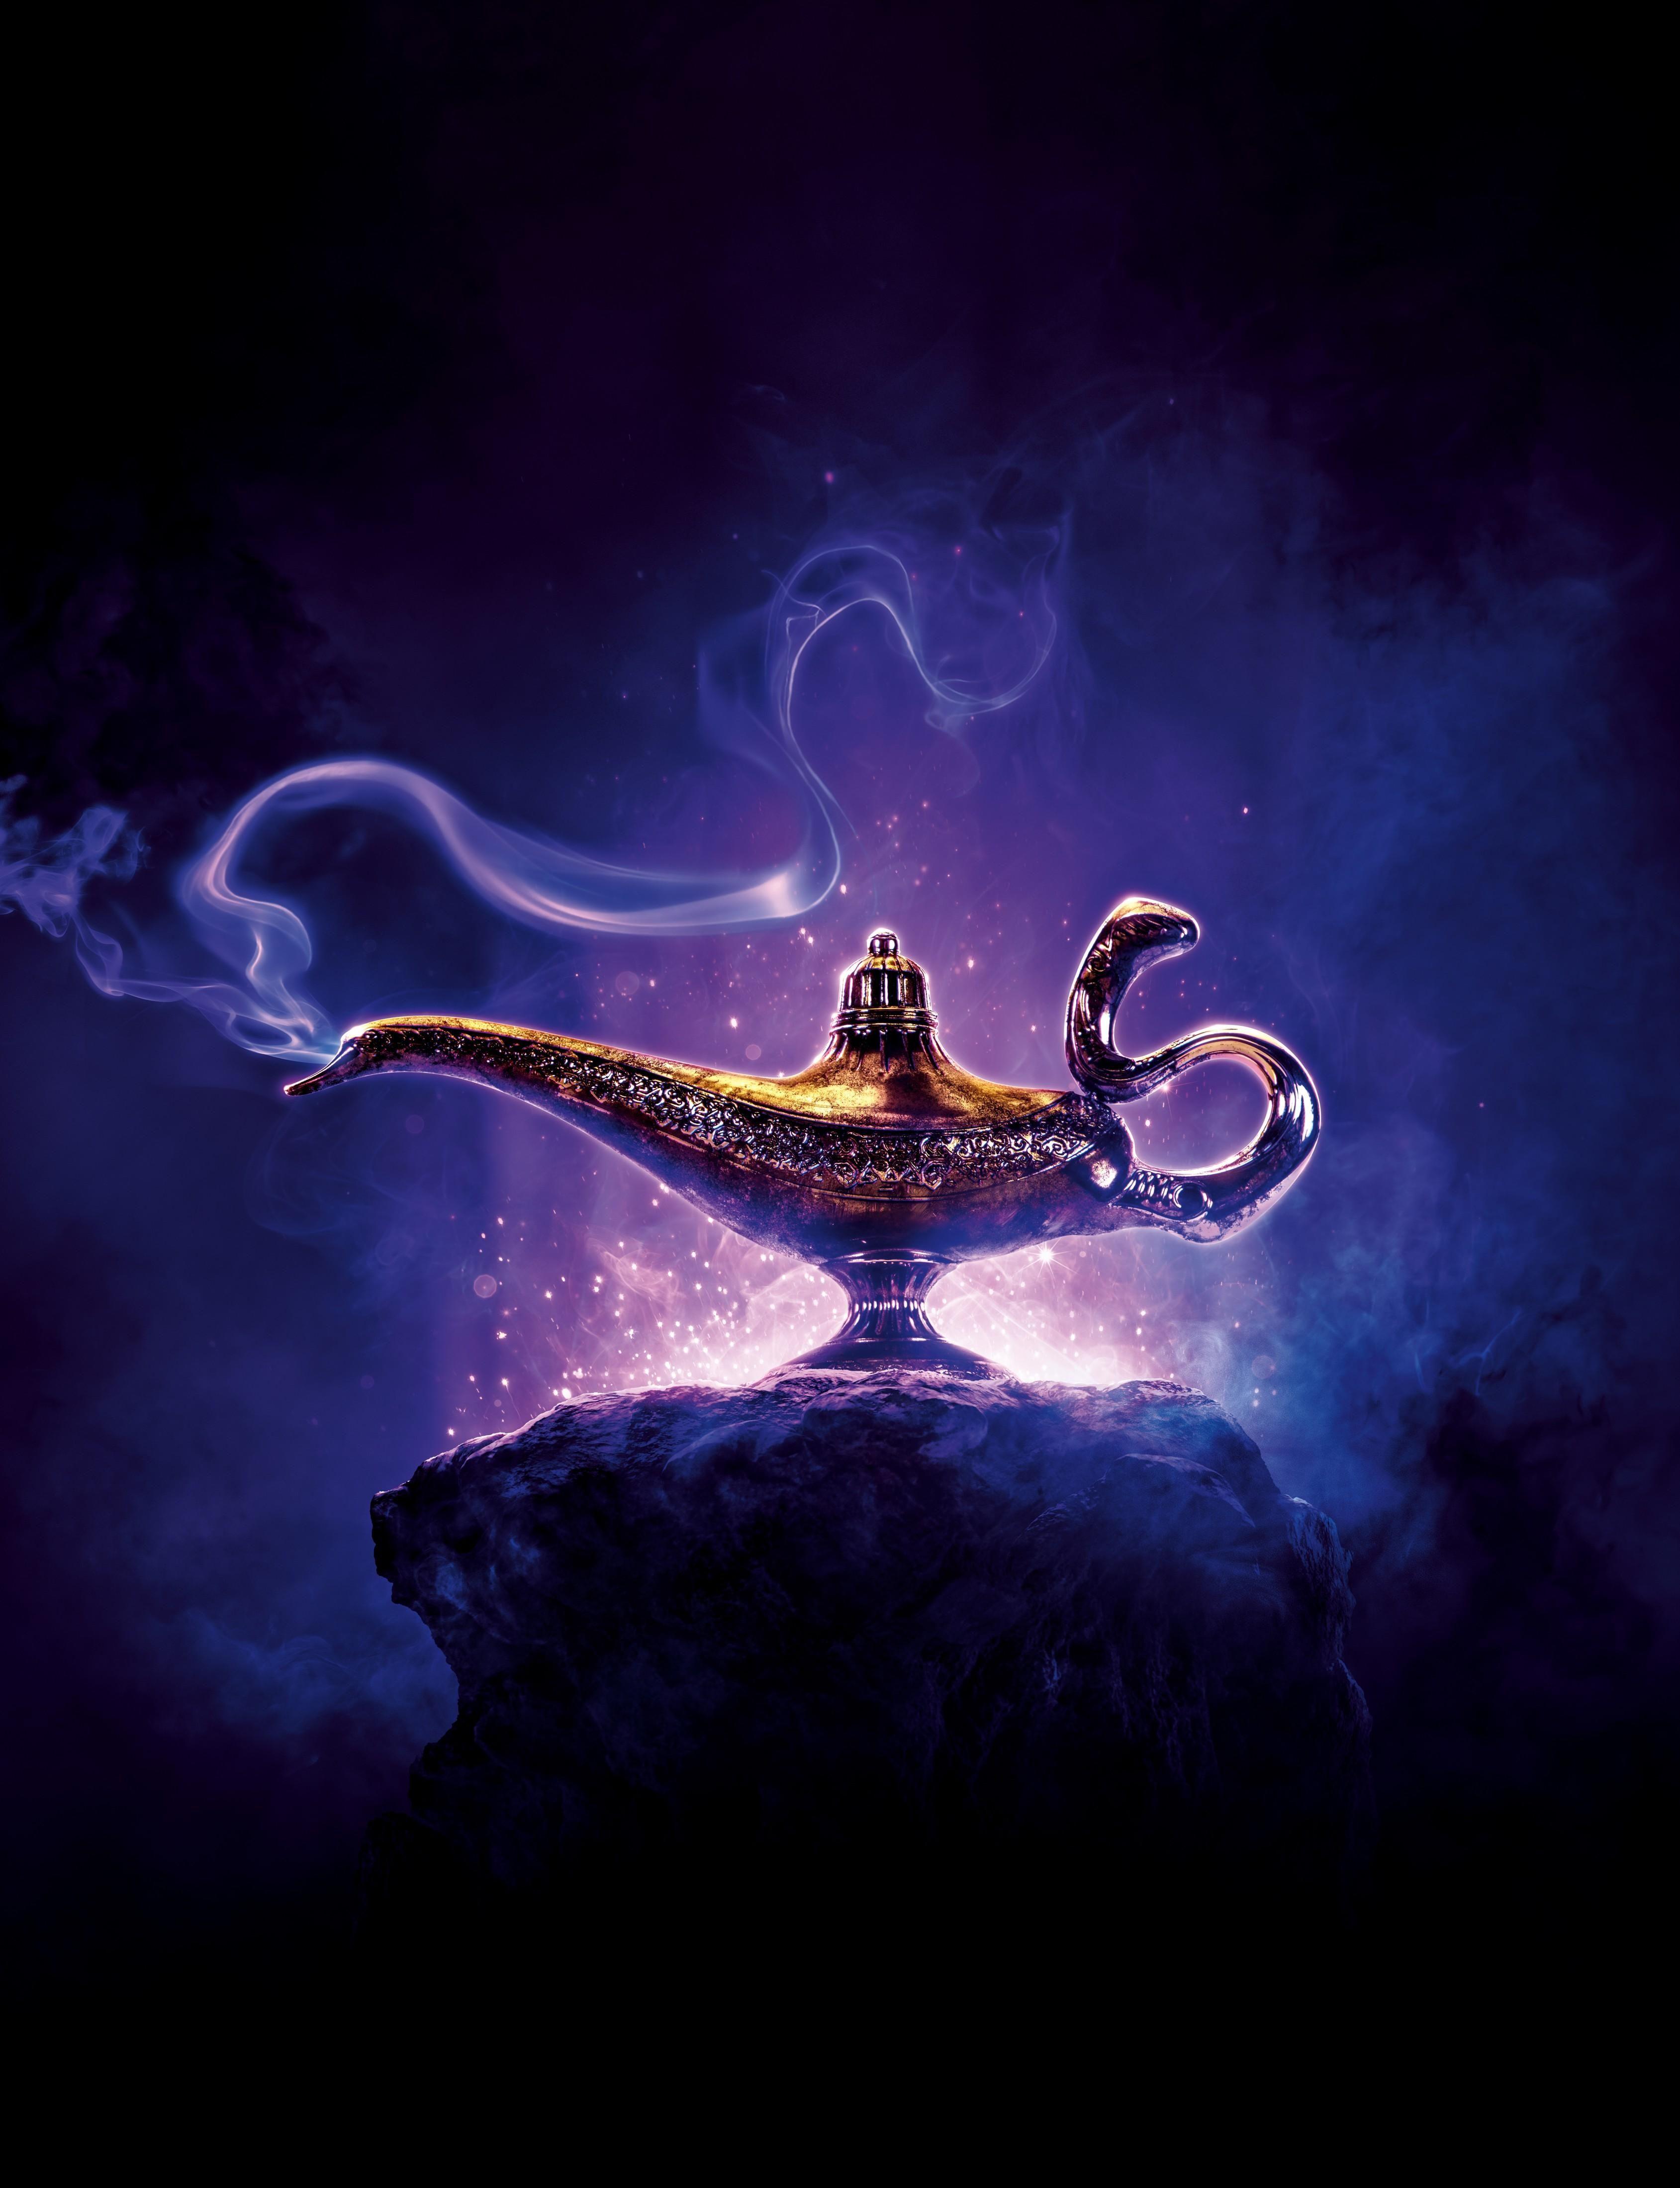 Wallpaper Aladdin, Disney, 2019, 4k, Movies, 16270